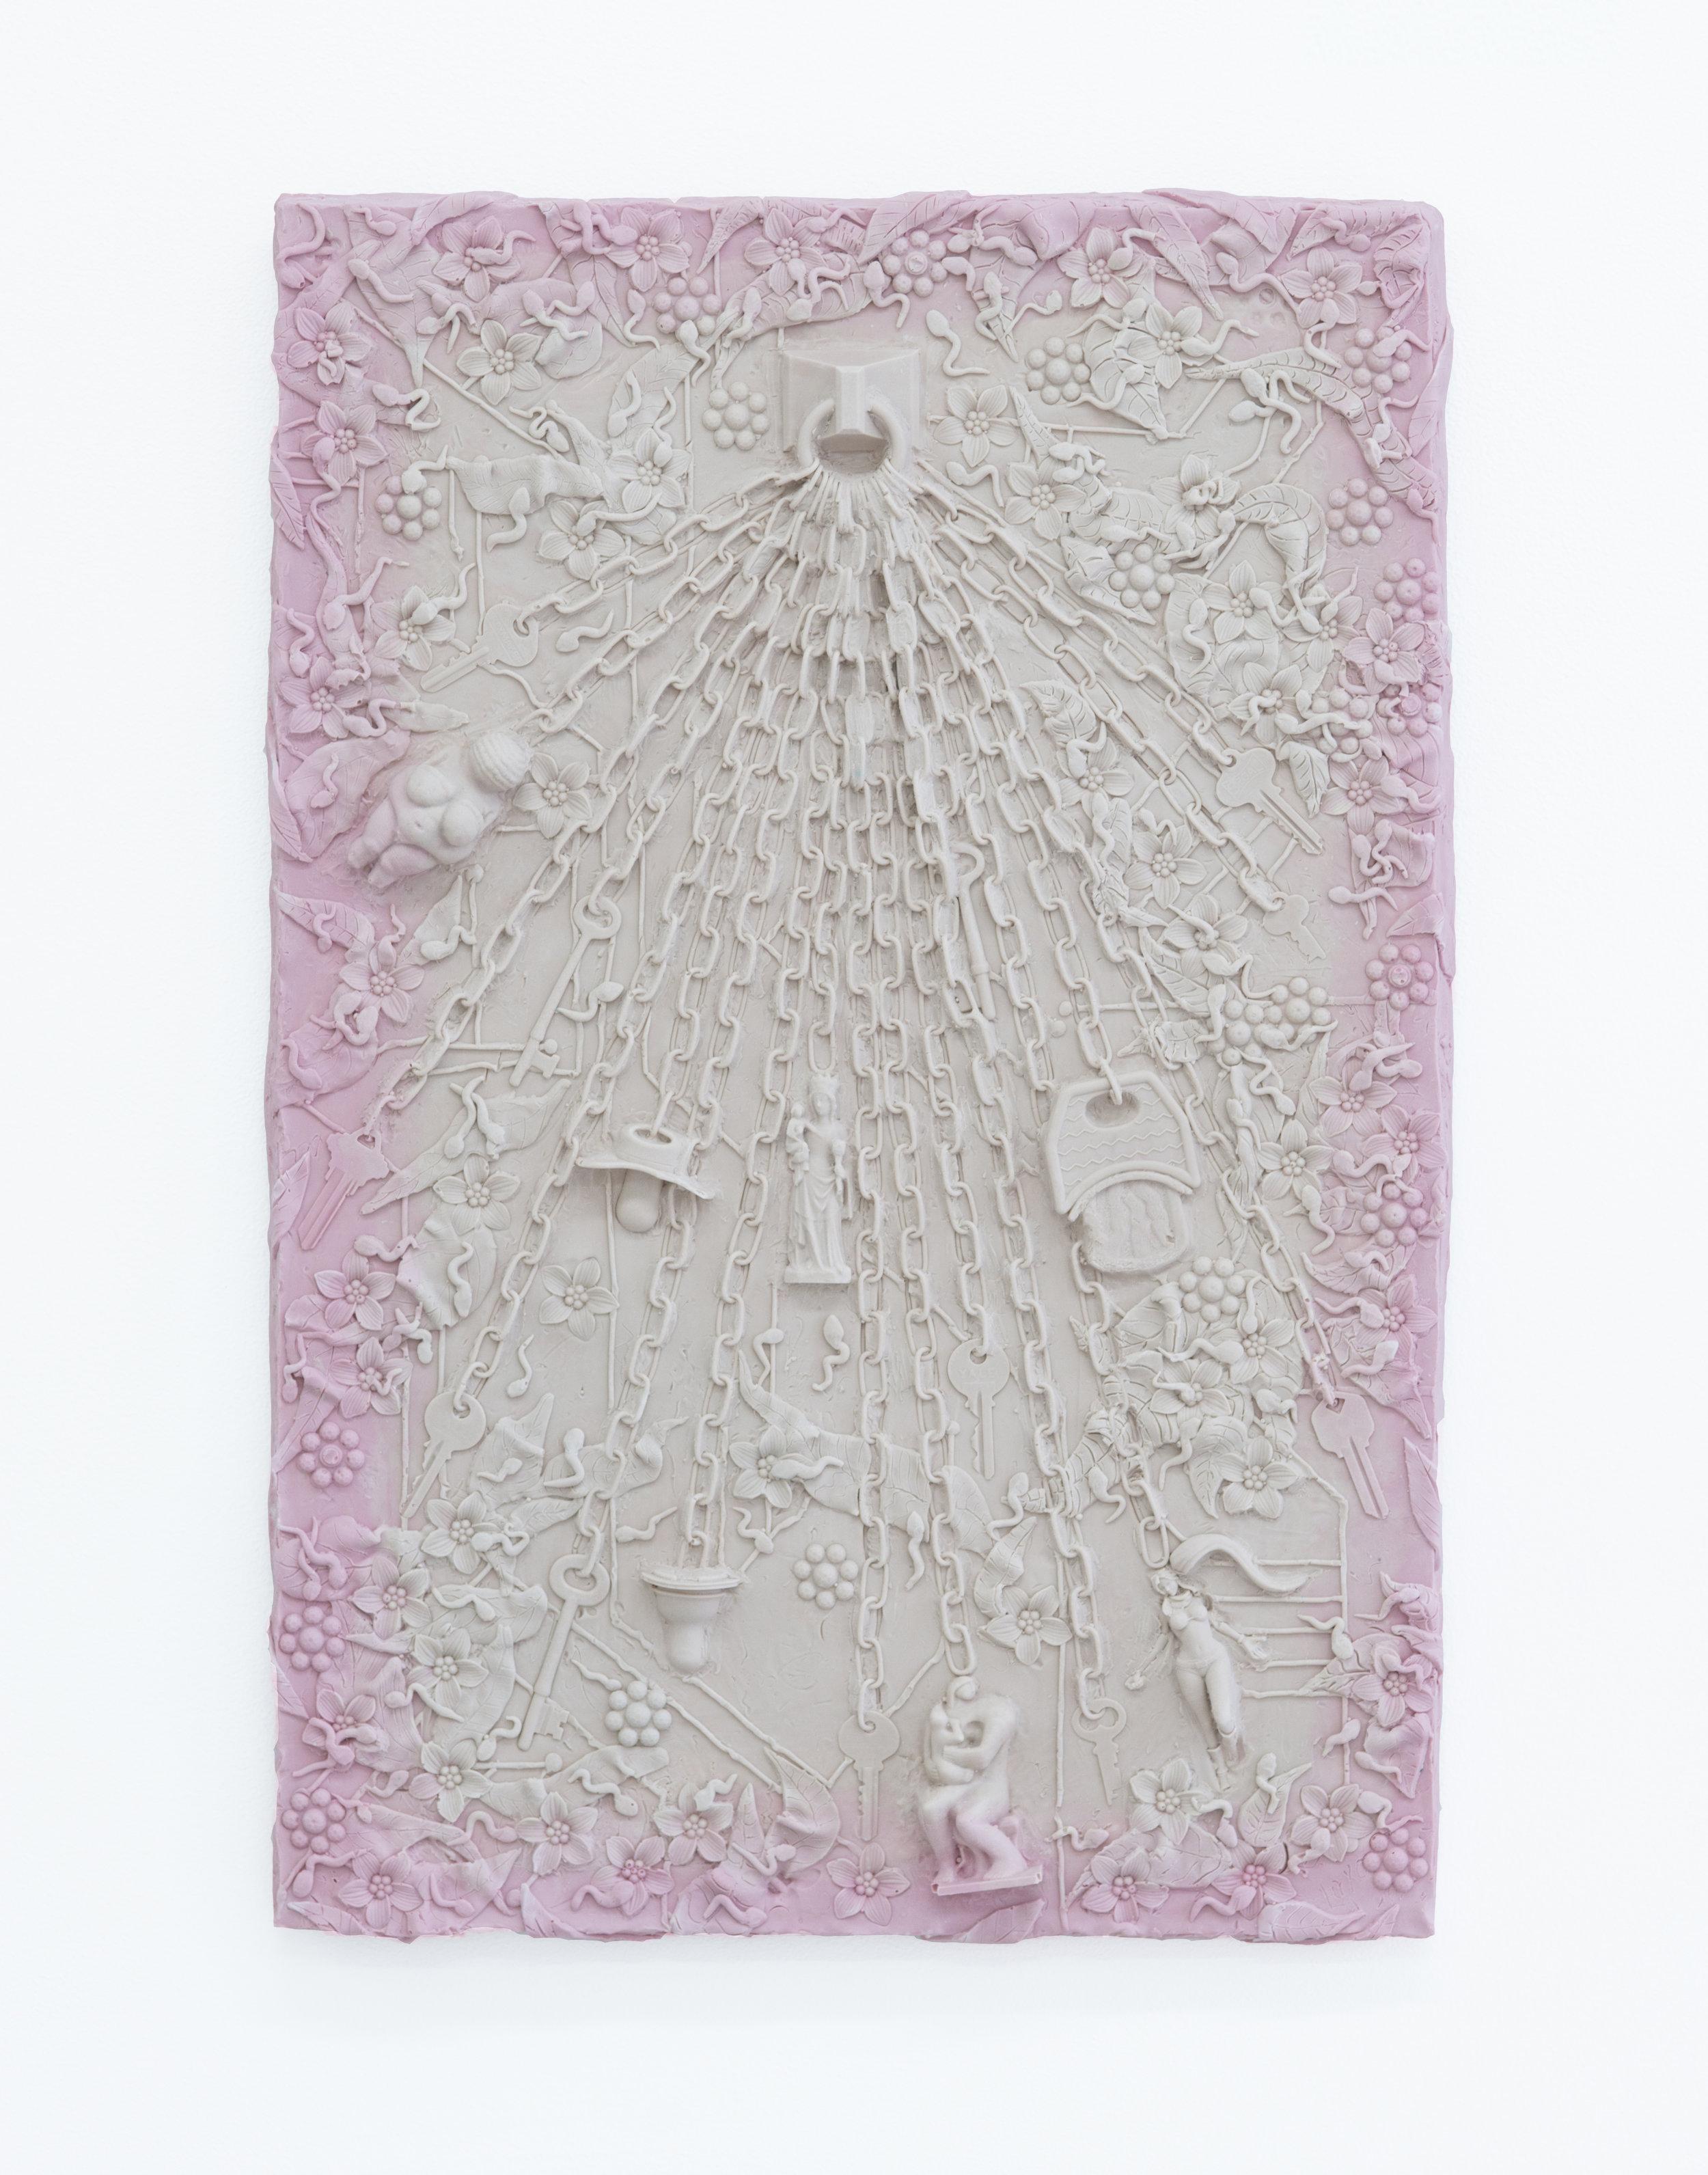 Loney Abrams + Johnny Stanish   Chatelaine,  2018  Aqua resin, berglass 26.5 x 18 inches